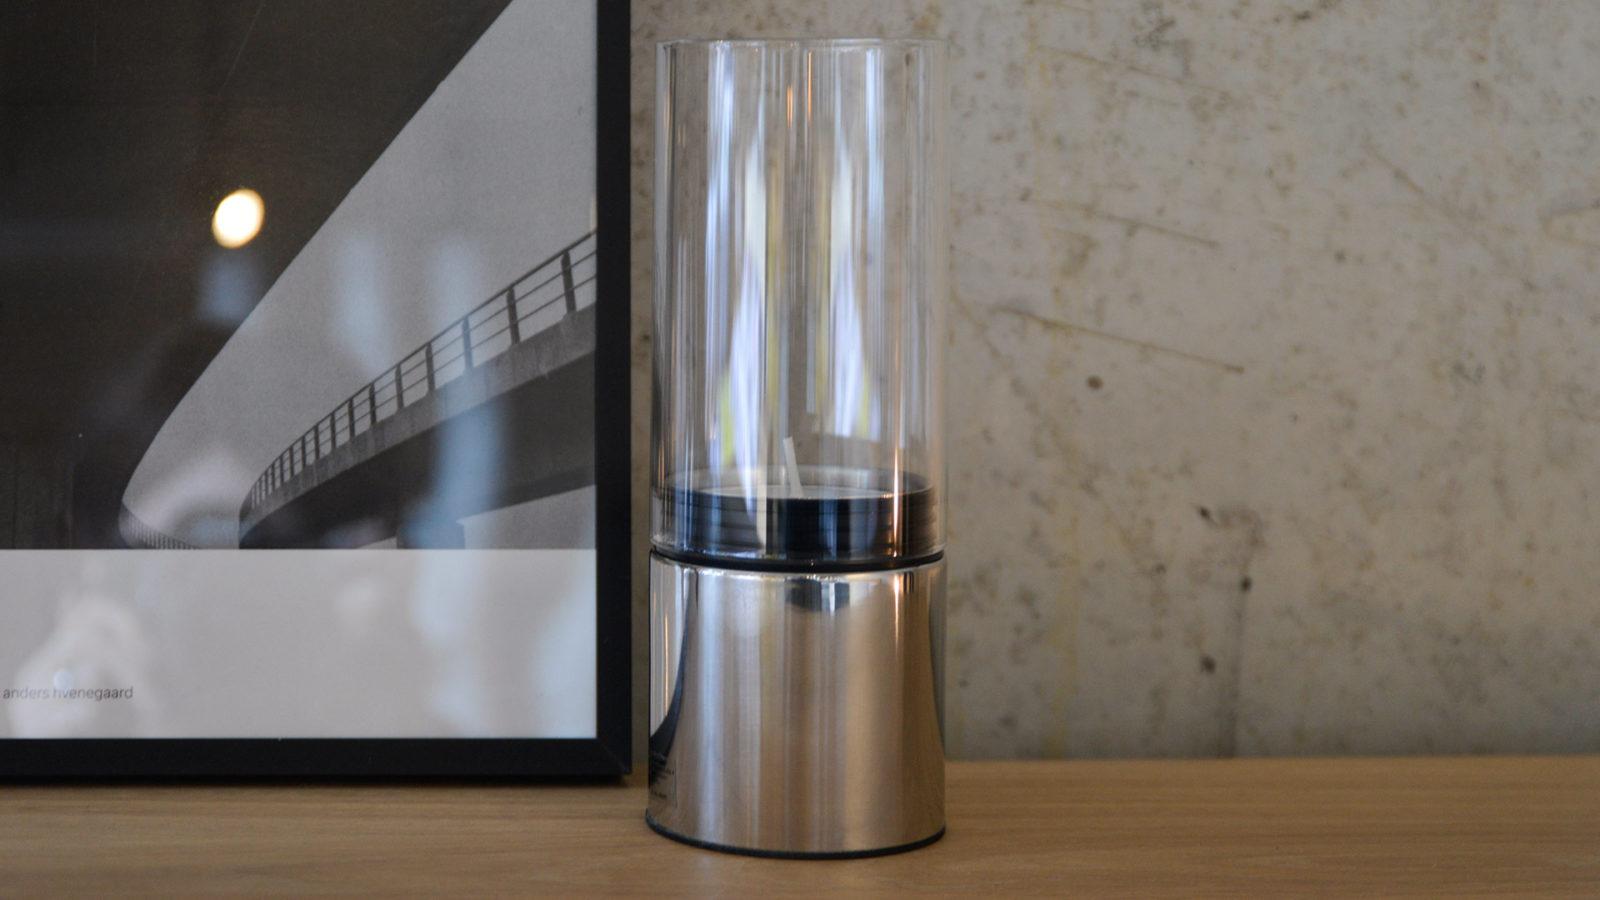 polished steel and glass lantern